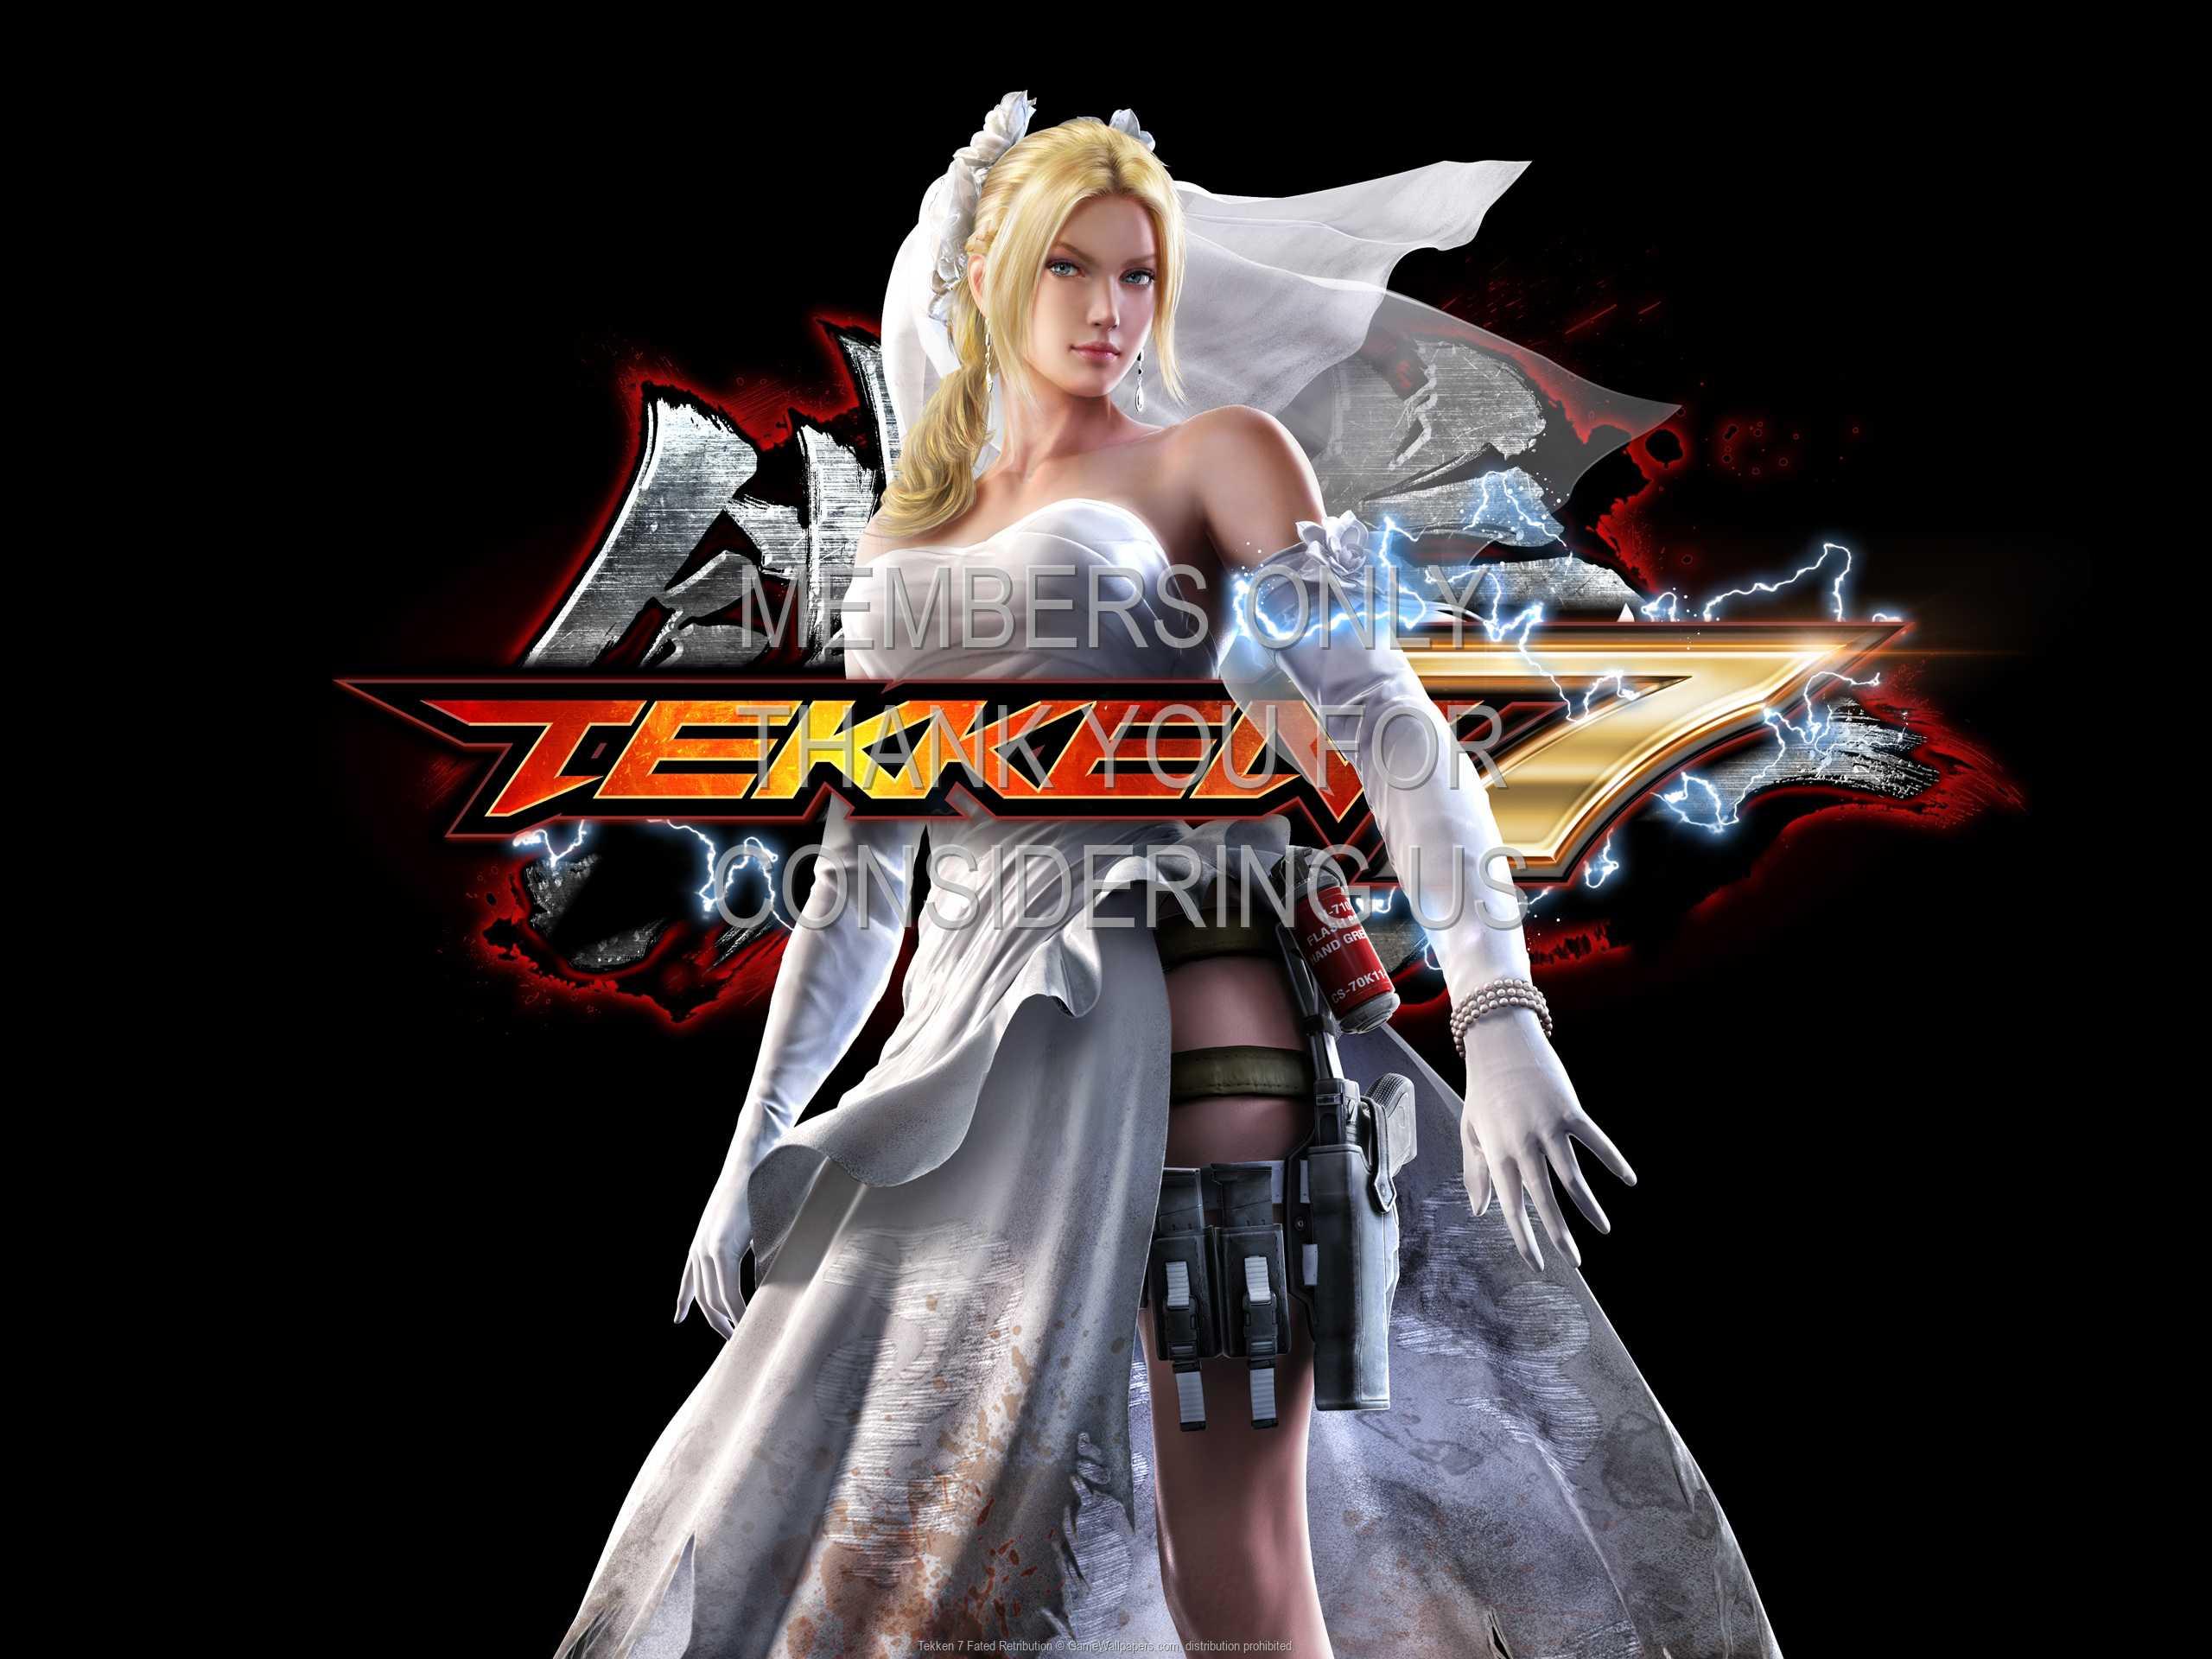 Tekken 7: Fated Retribution 1080p Horizontal Mobile wallpaper or background 01